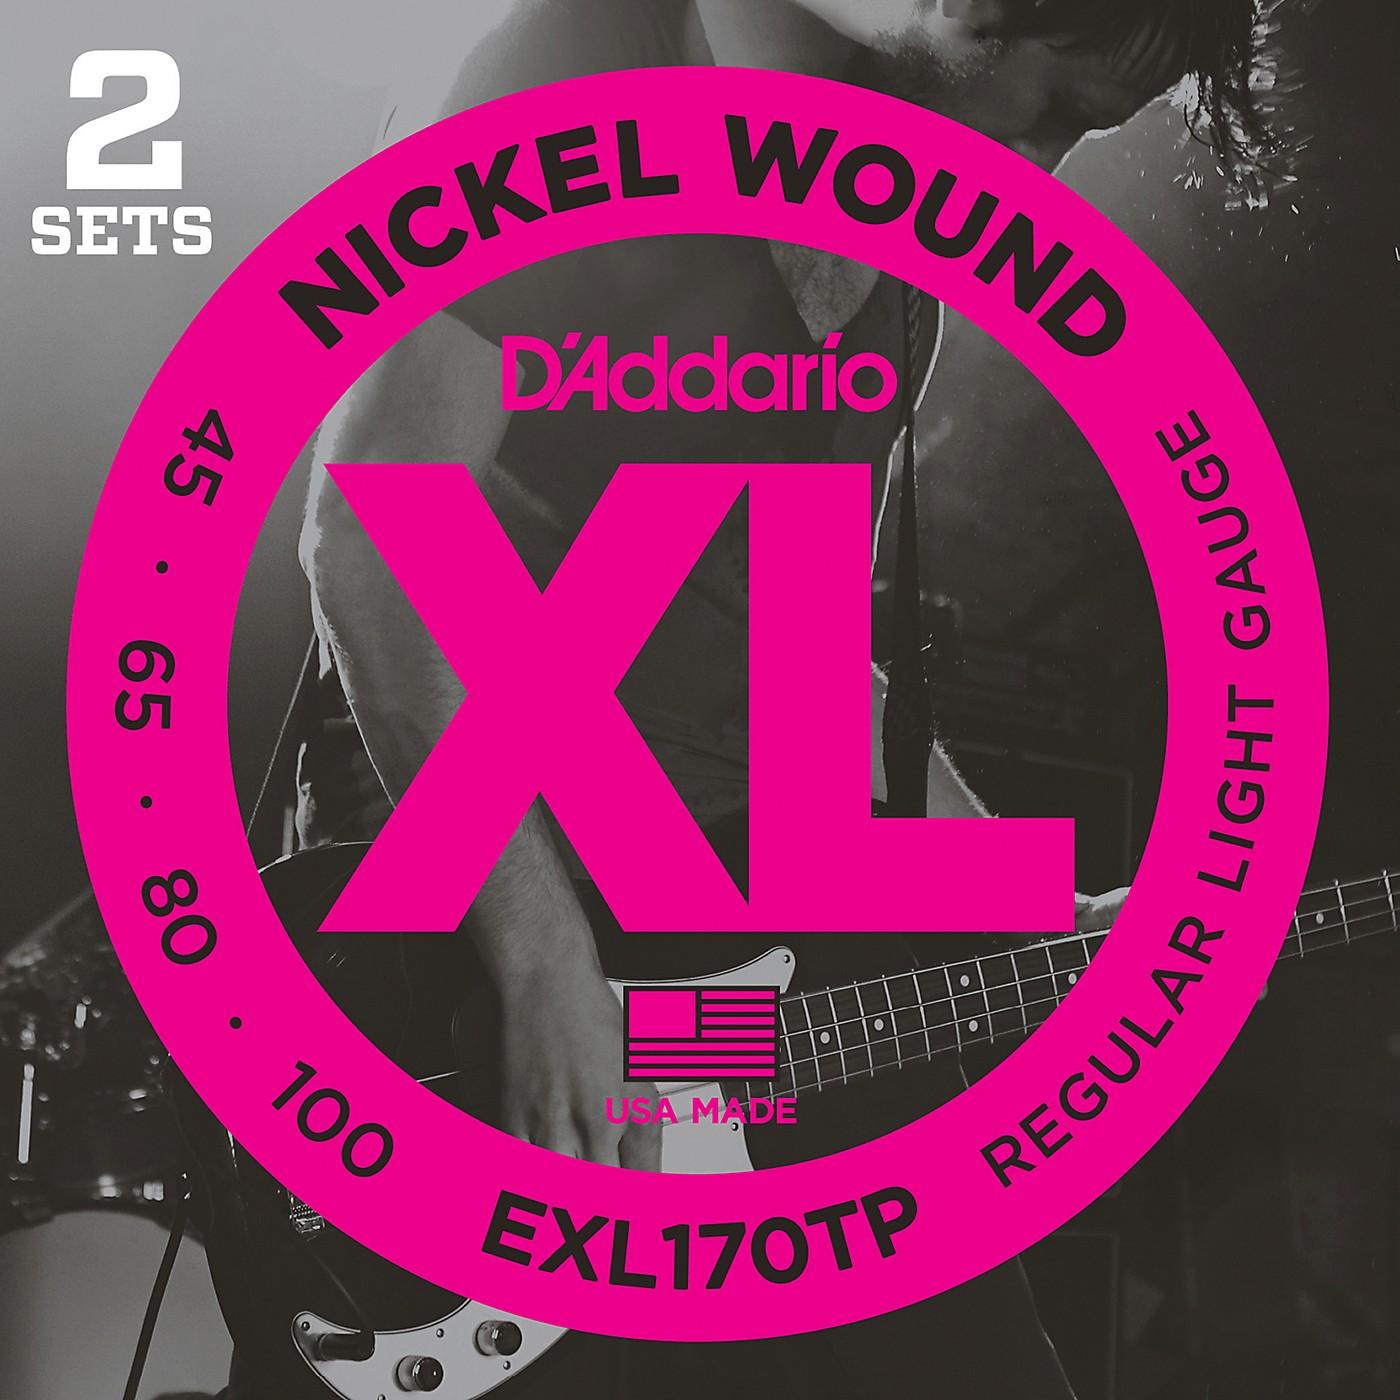 D'Addario EXL170TP Round Wound Bass Guitar Strings 2-Pack thumbnail